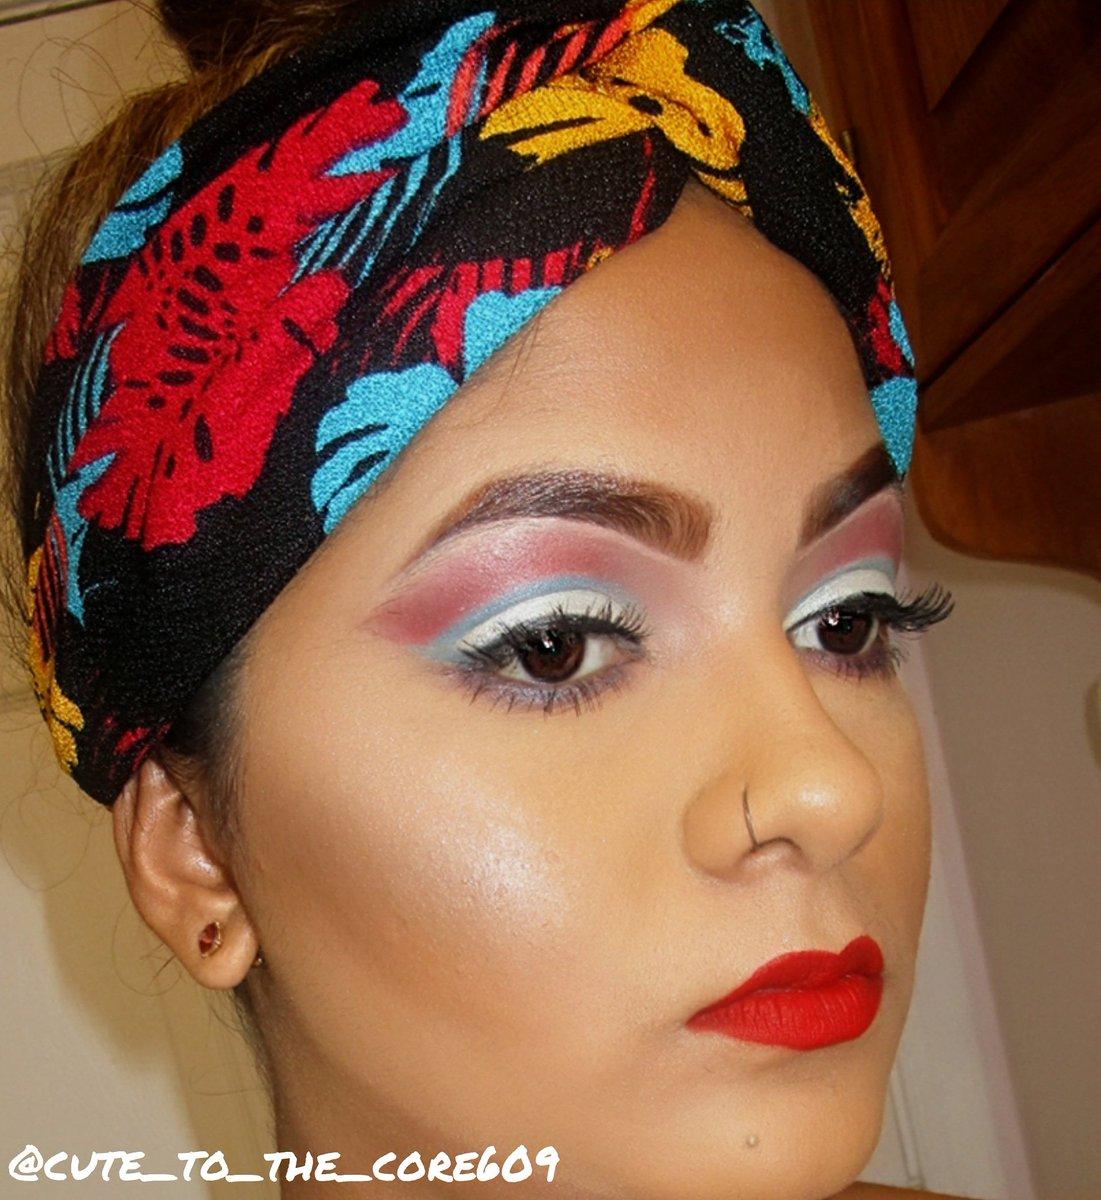 I'll Just Leave This Here 👀   MAKEUP DEETS: @elfcosmetics Concealer  @nyxcosmetics Foundation  @sephora Lippie  @ColourPopCo Eyeshadow  @ABHcosmetics Highlighter  @ardellbeauty Lashes   #abh #nyx #makeuplook #motd…